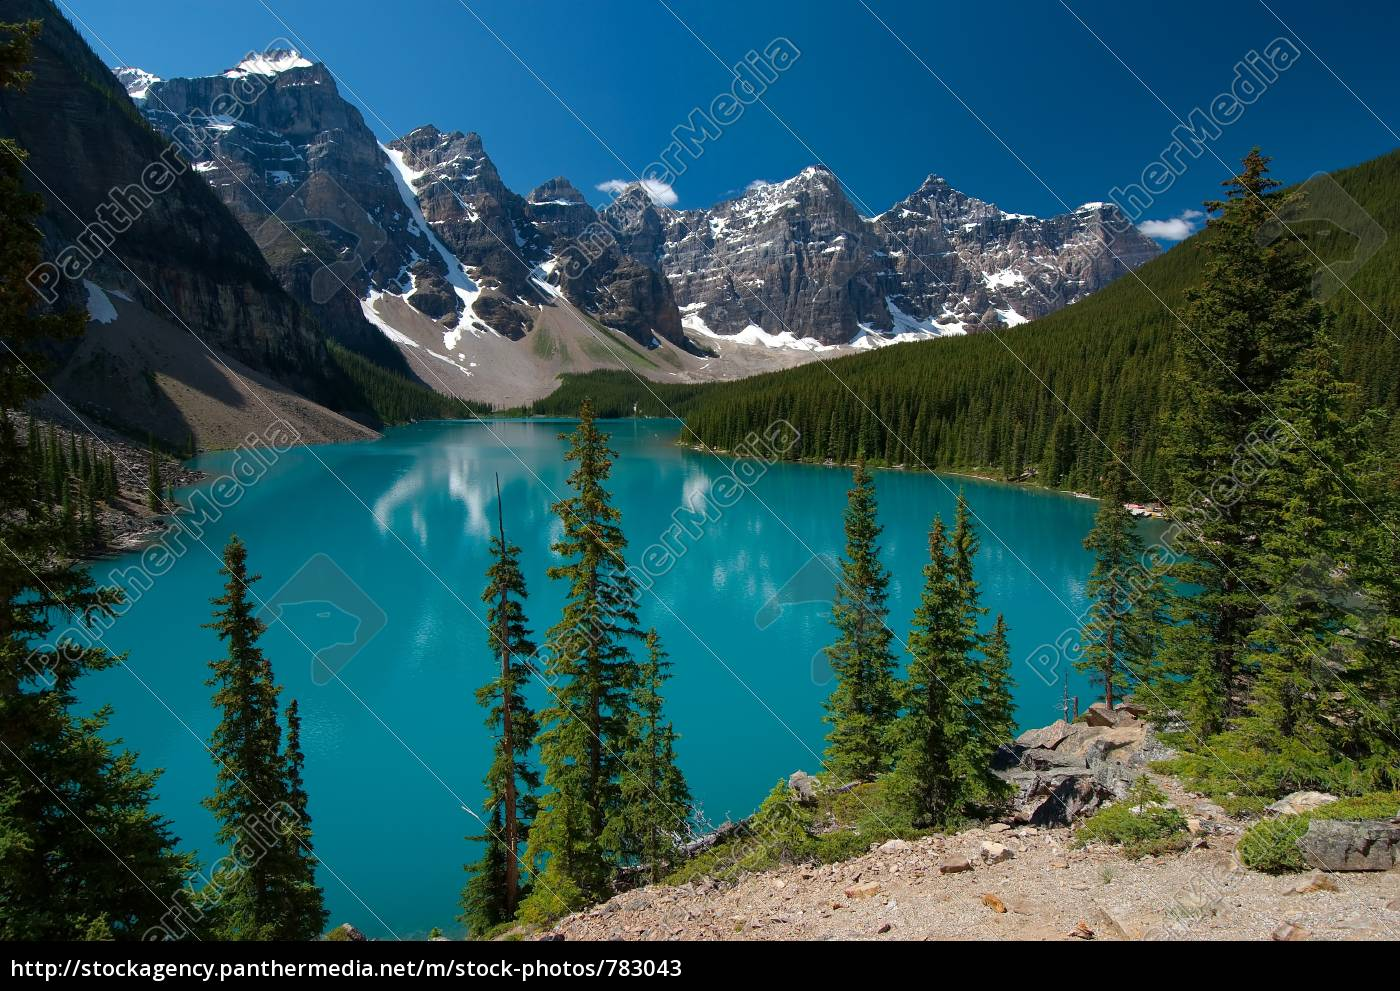 moraine, lake - 783043